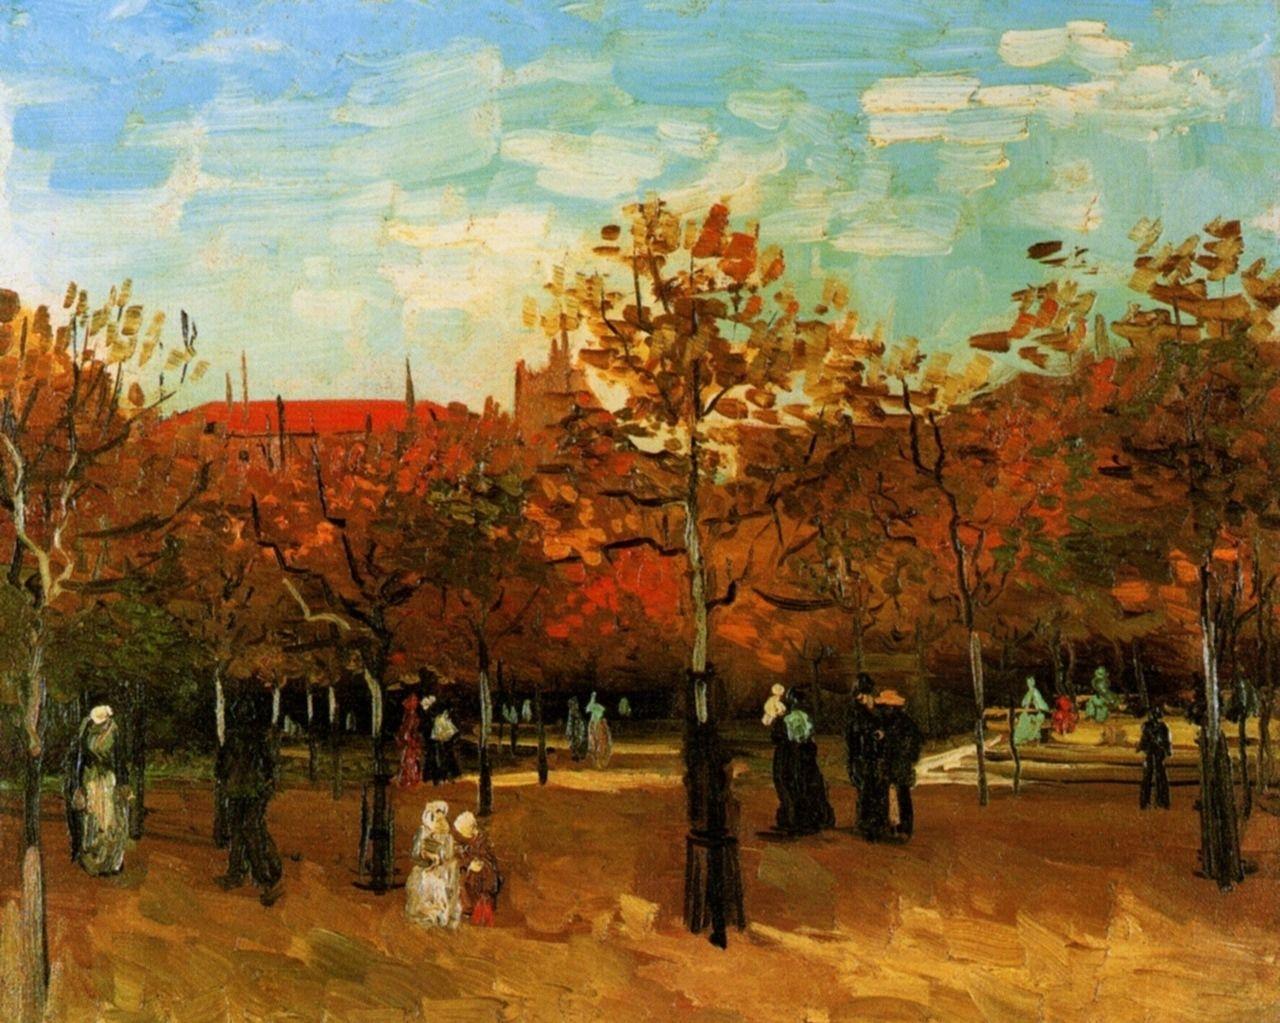 The Bois De Boulogne With People Walking 1886 Vincent Van Gogh Medium Oil On Canvas Van Gogh Art Van Gogh Landscapes Gogh